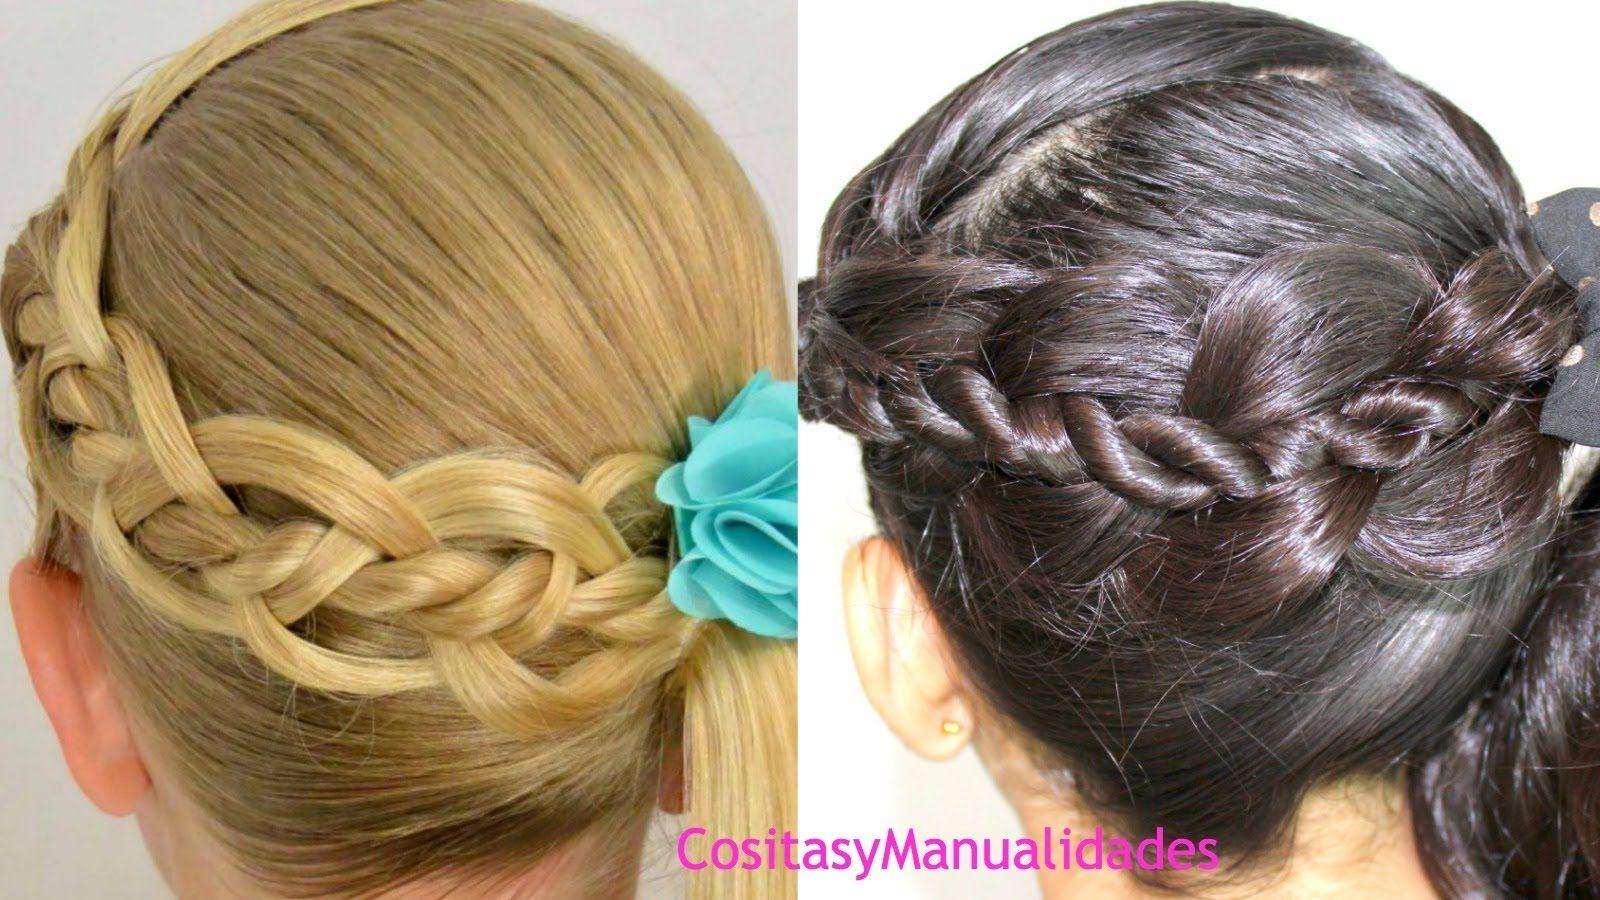 peinados para ninastrenza de cuatro con torcidos peinados faciles